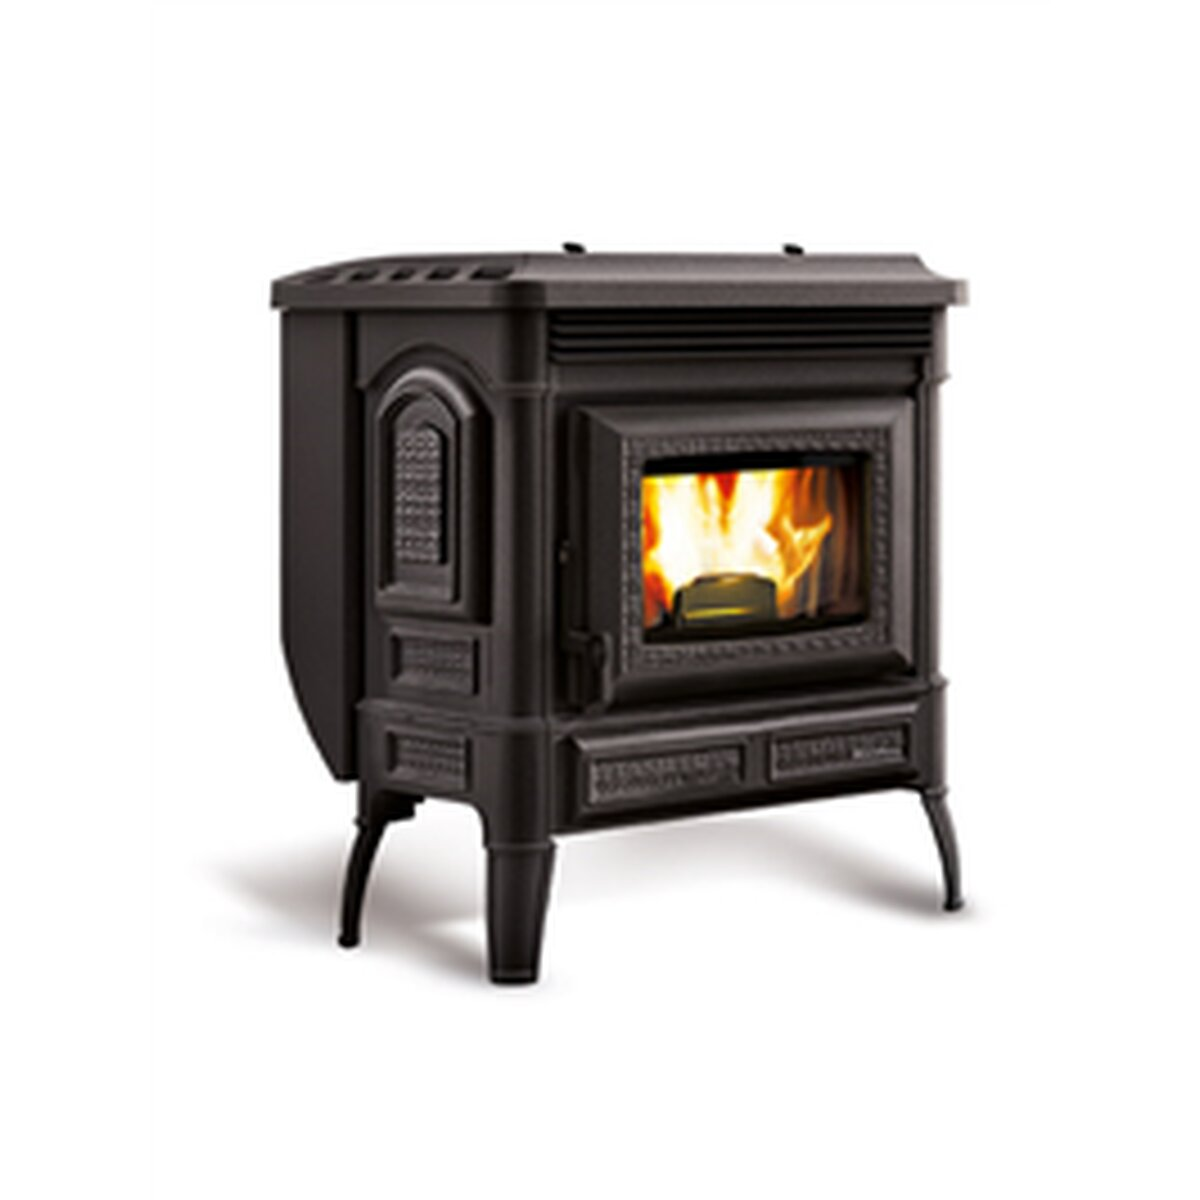 la nordica extraflame teodora gusseisen kaufen feuer fuchs von extraflame s p. Black Bedroom Furniture Sets. Home Design Ideas